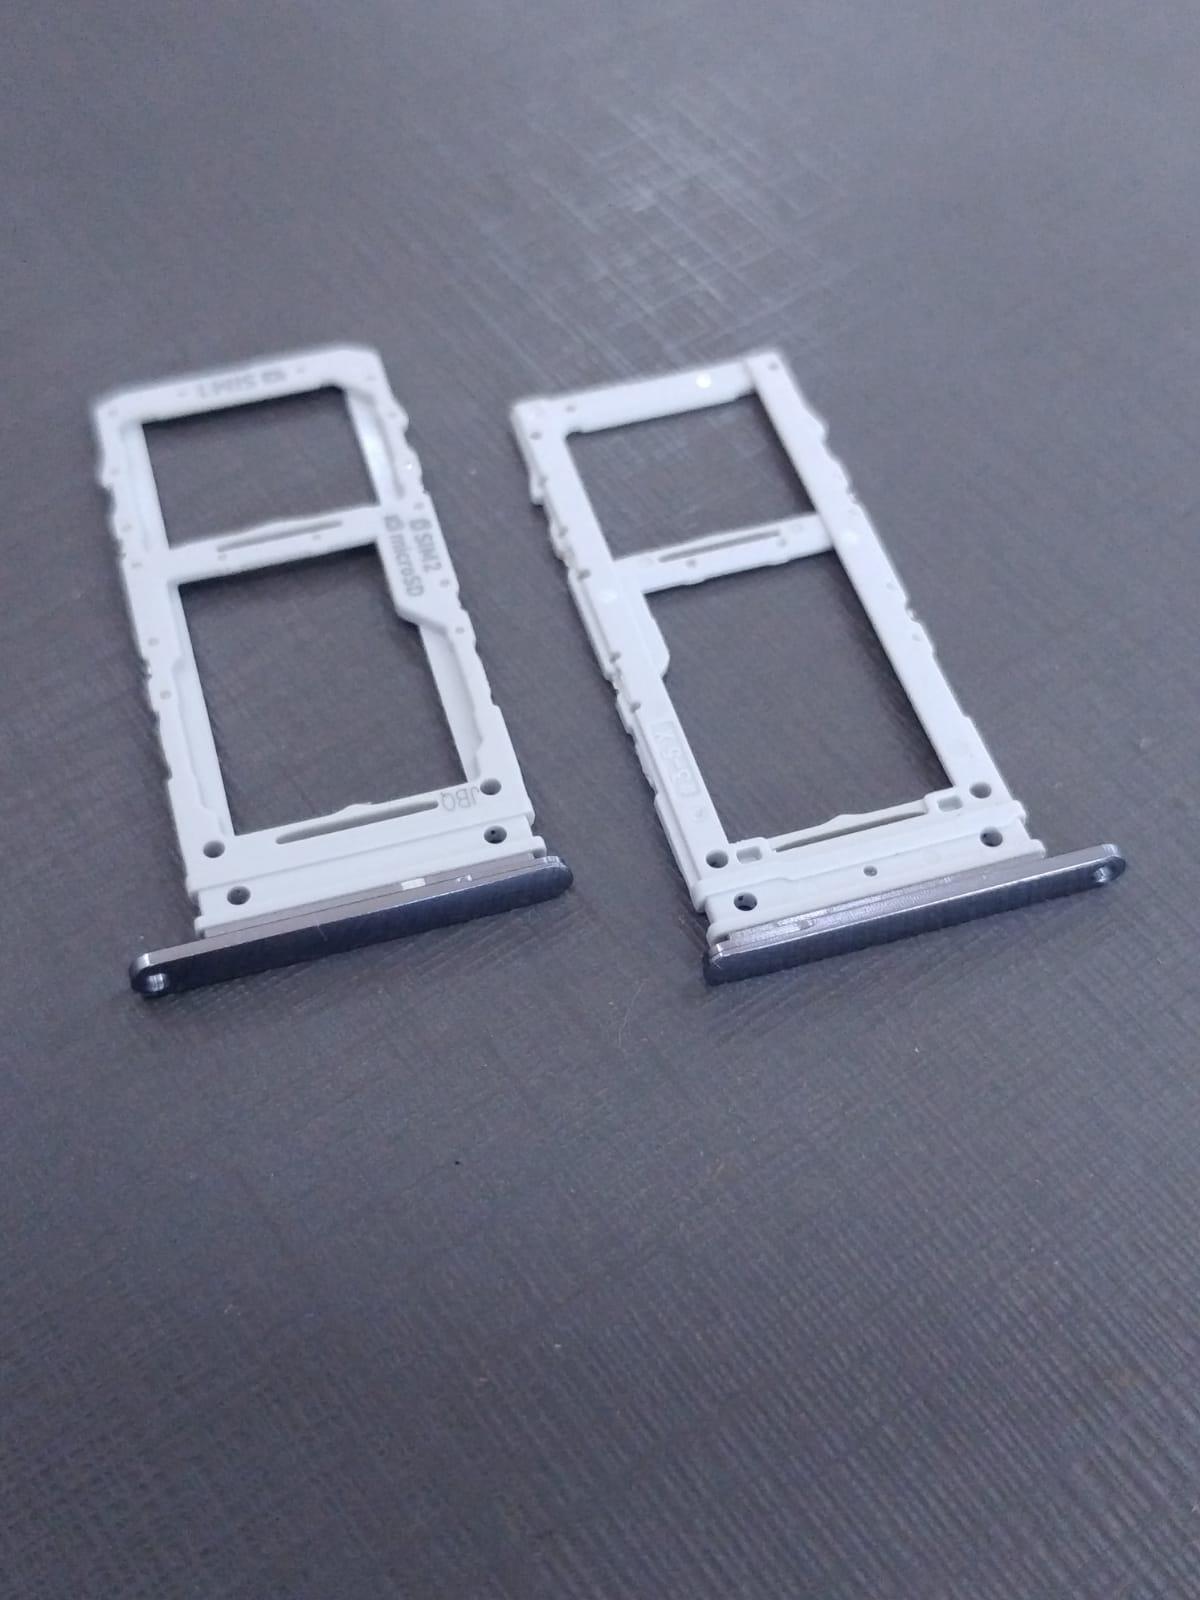 Gaveta Bandeja Slot Chip Samsung Galaxy S20 Plus Sem Vedação